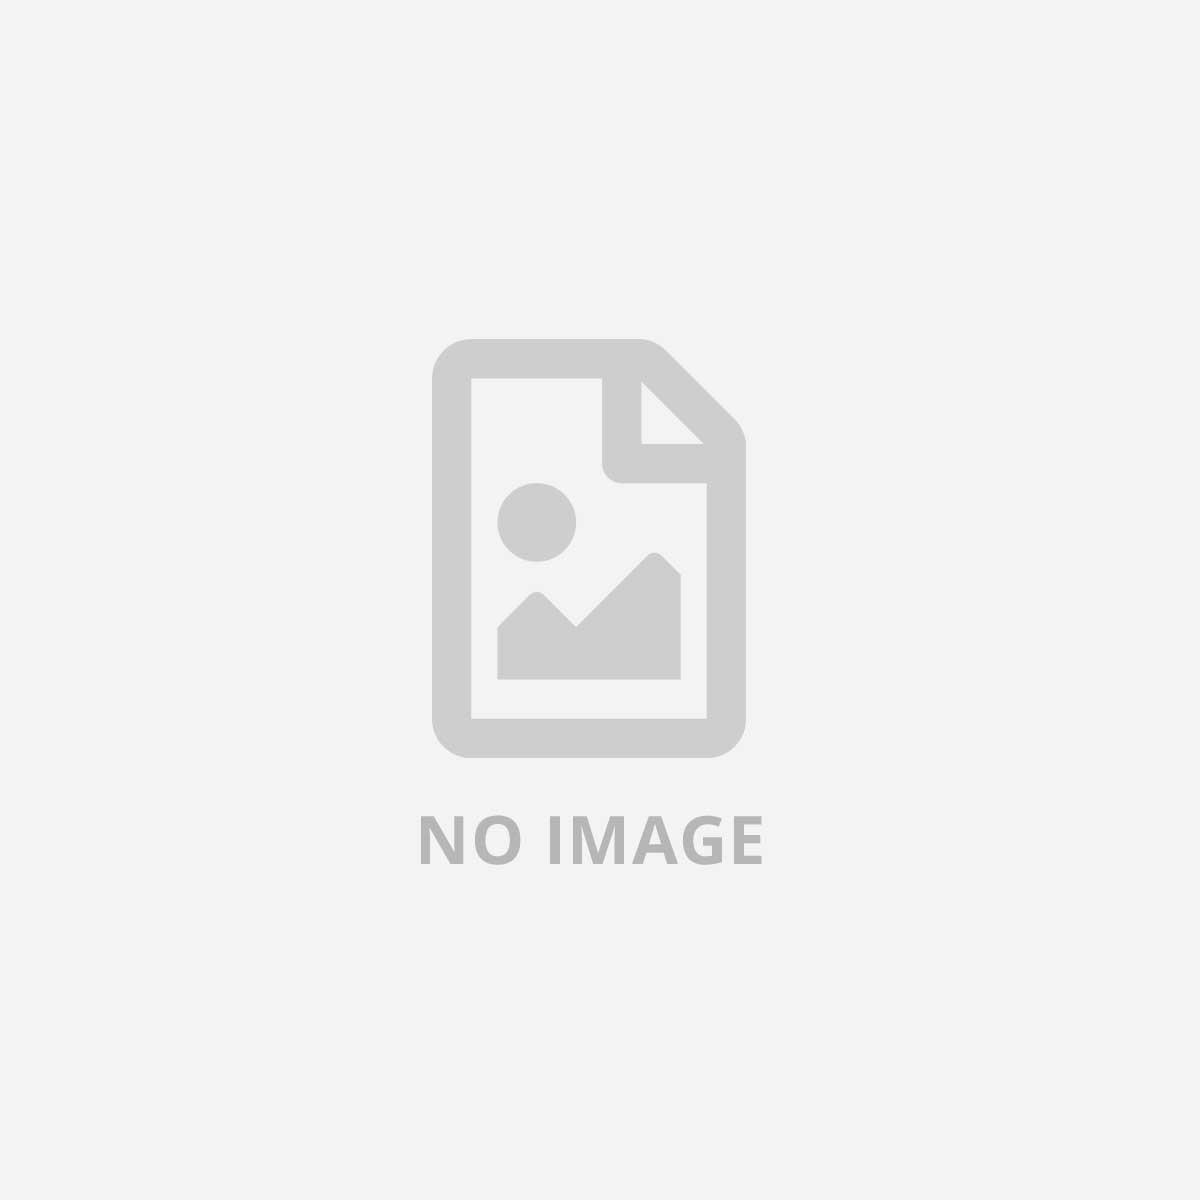 TELESYSTEM SNAPRUN MP3